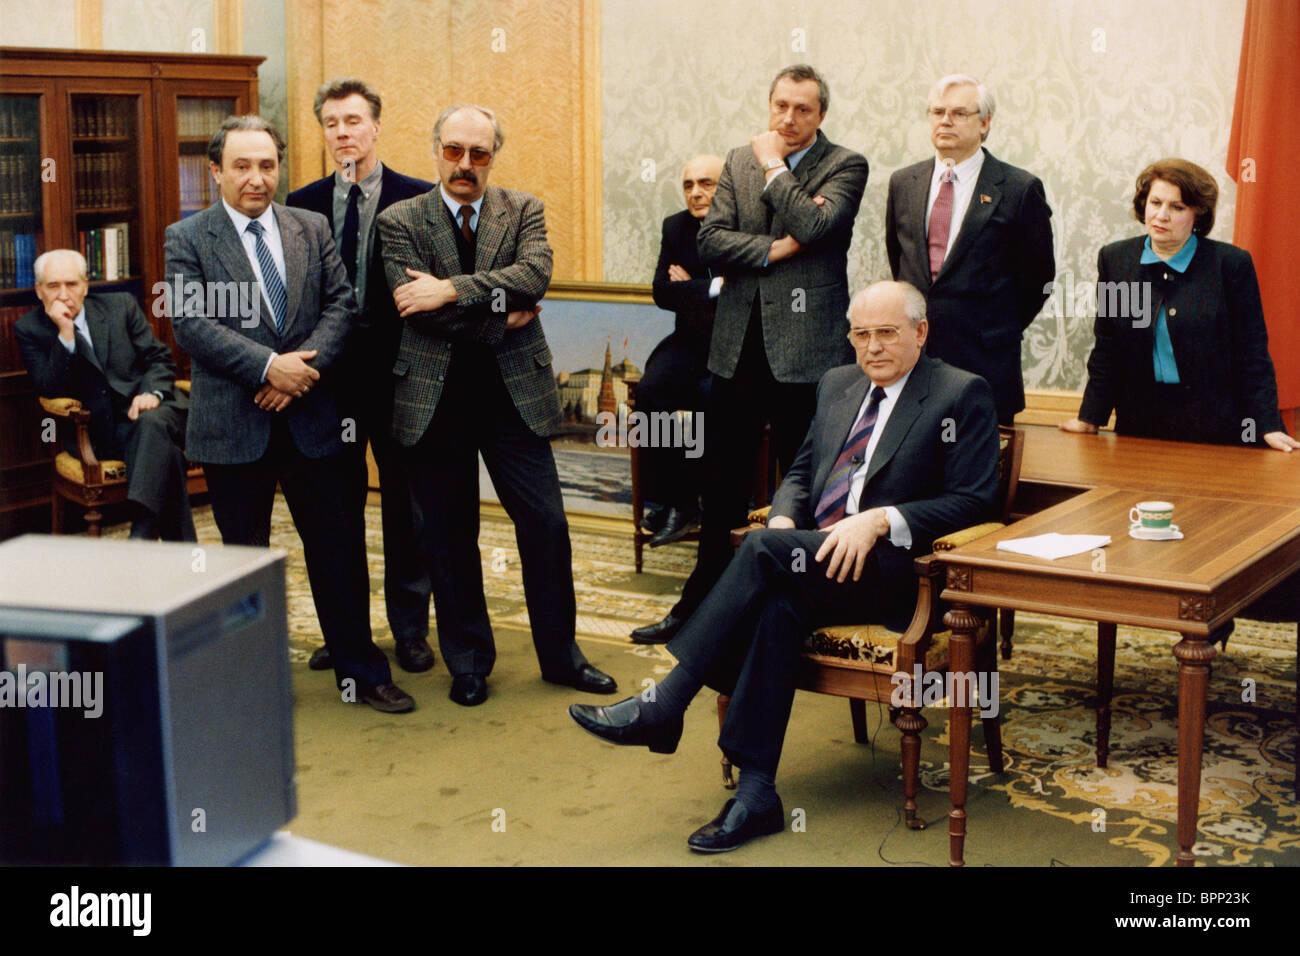 Mikhail Gorbachev to watch Boris Yeltsin's speech, 1991 - Stock Image